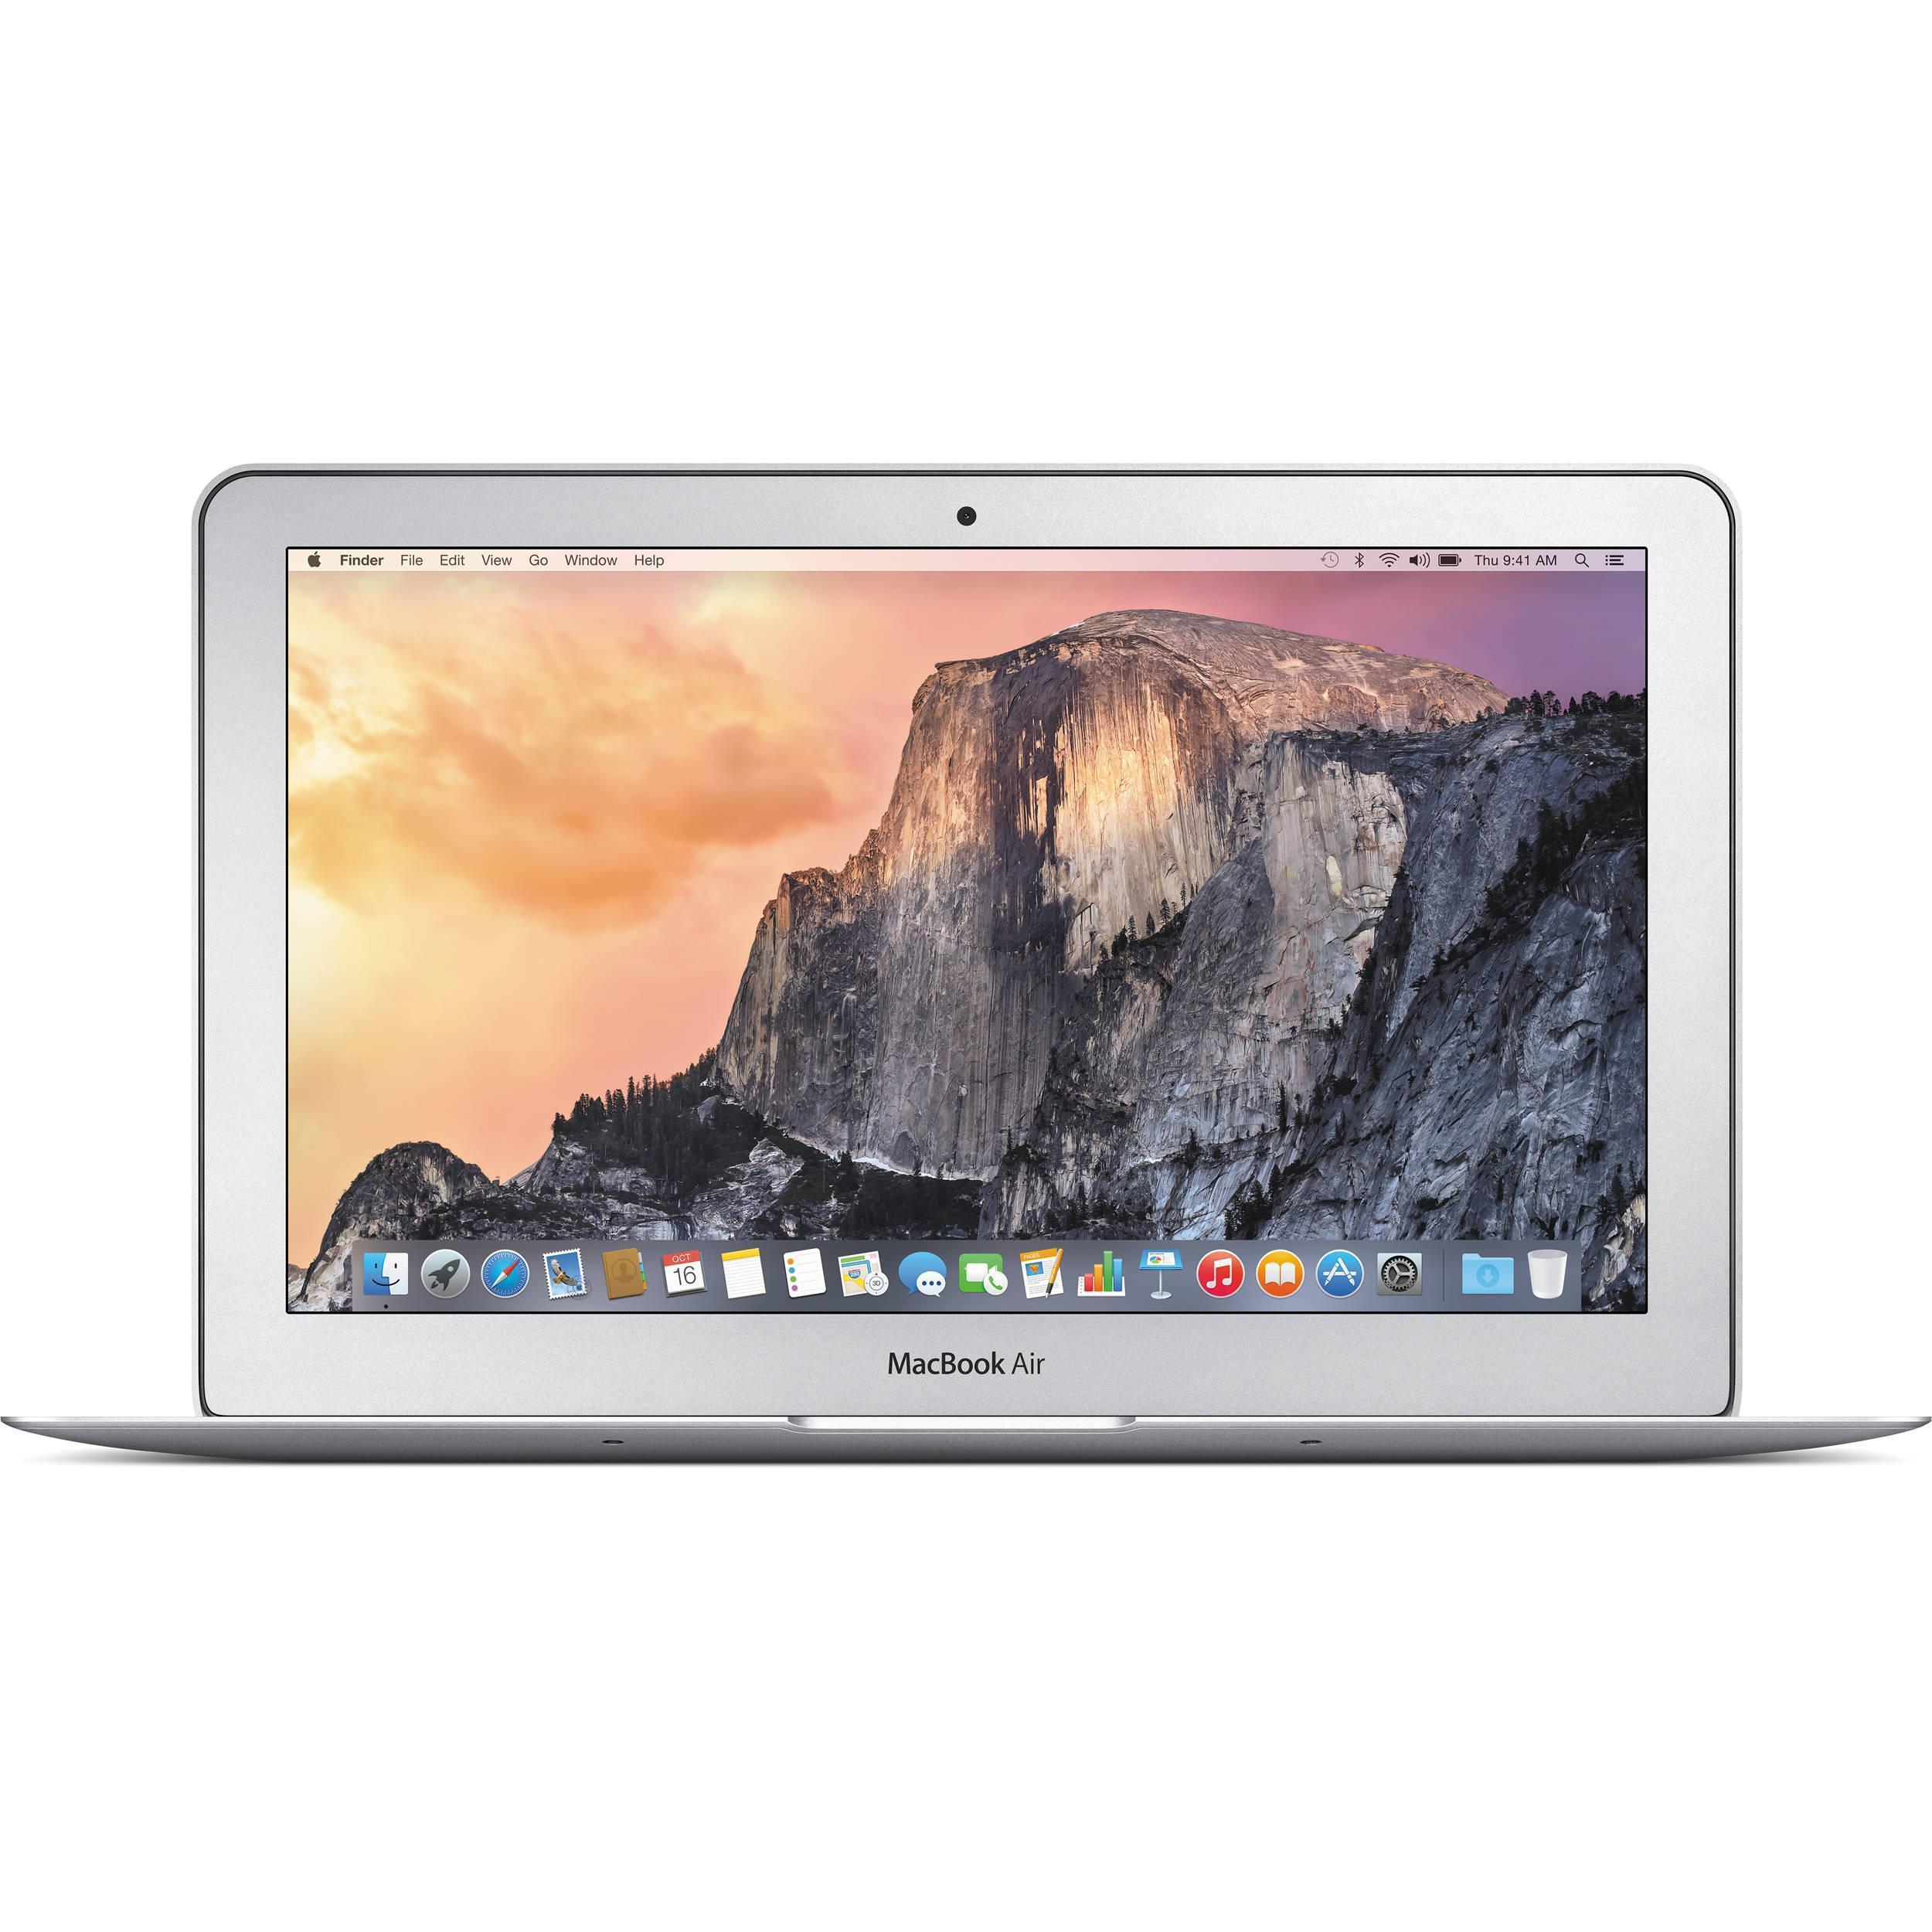 MacBook Air 11,6-tum (2011) - Core i5 - 4GB - SSD 64 GB QWERTY - Nederländska